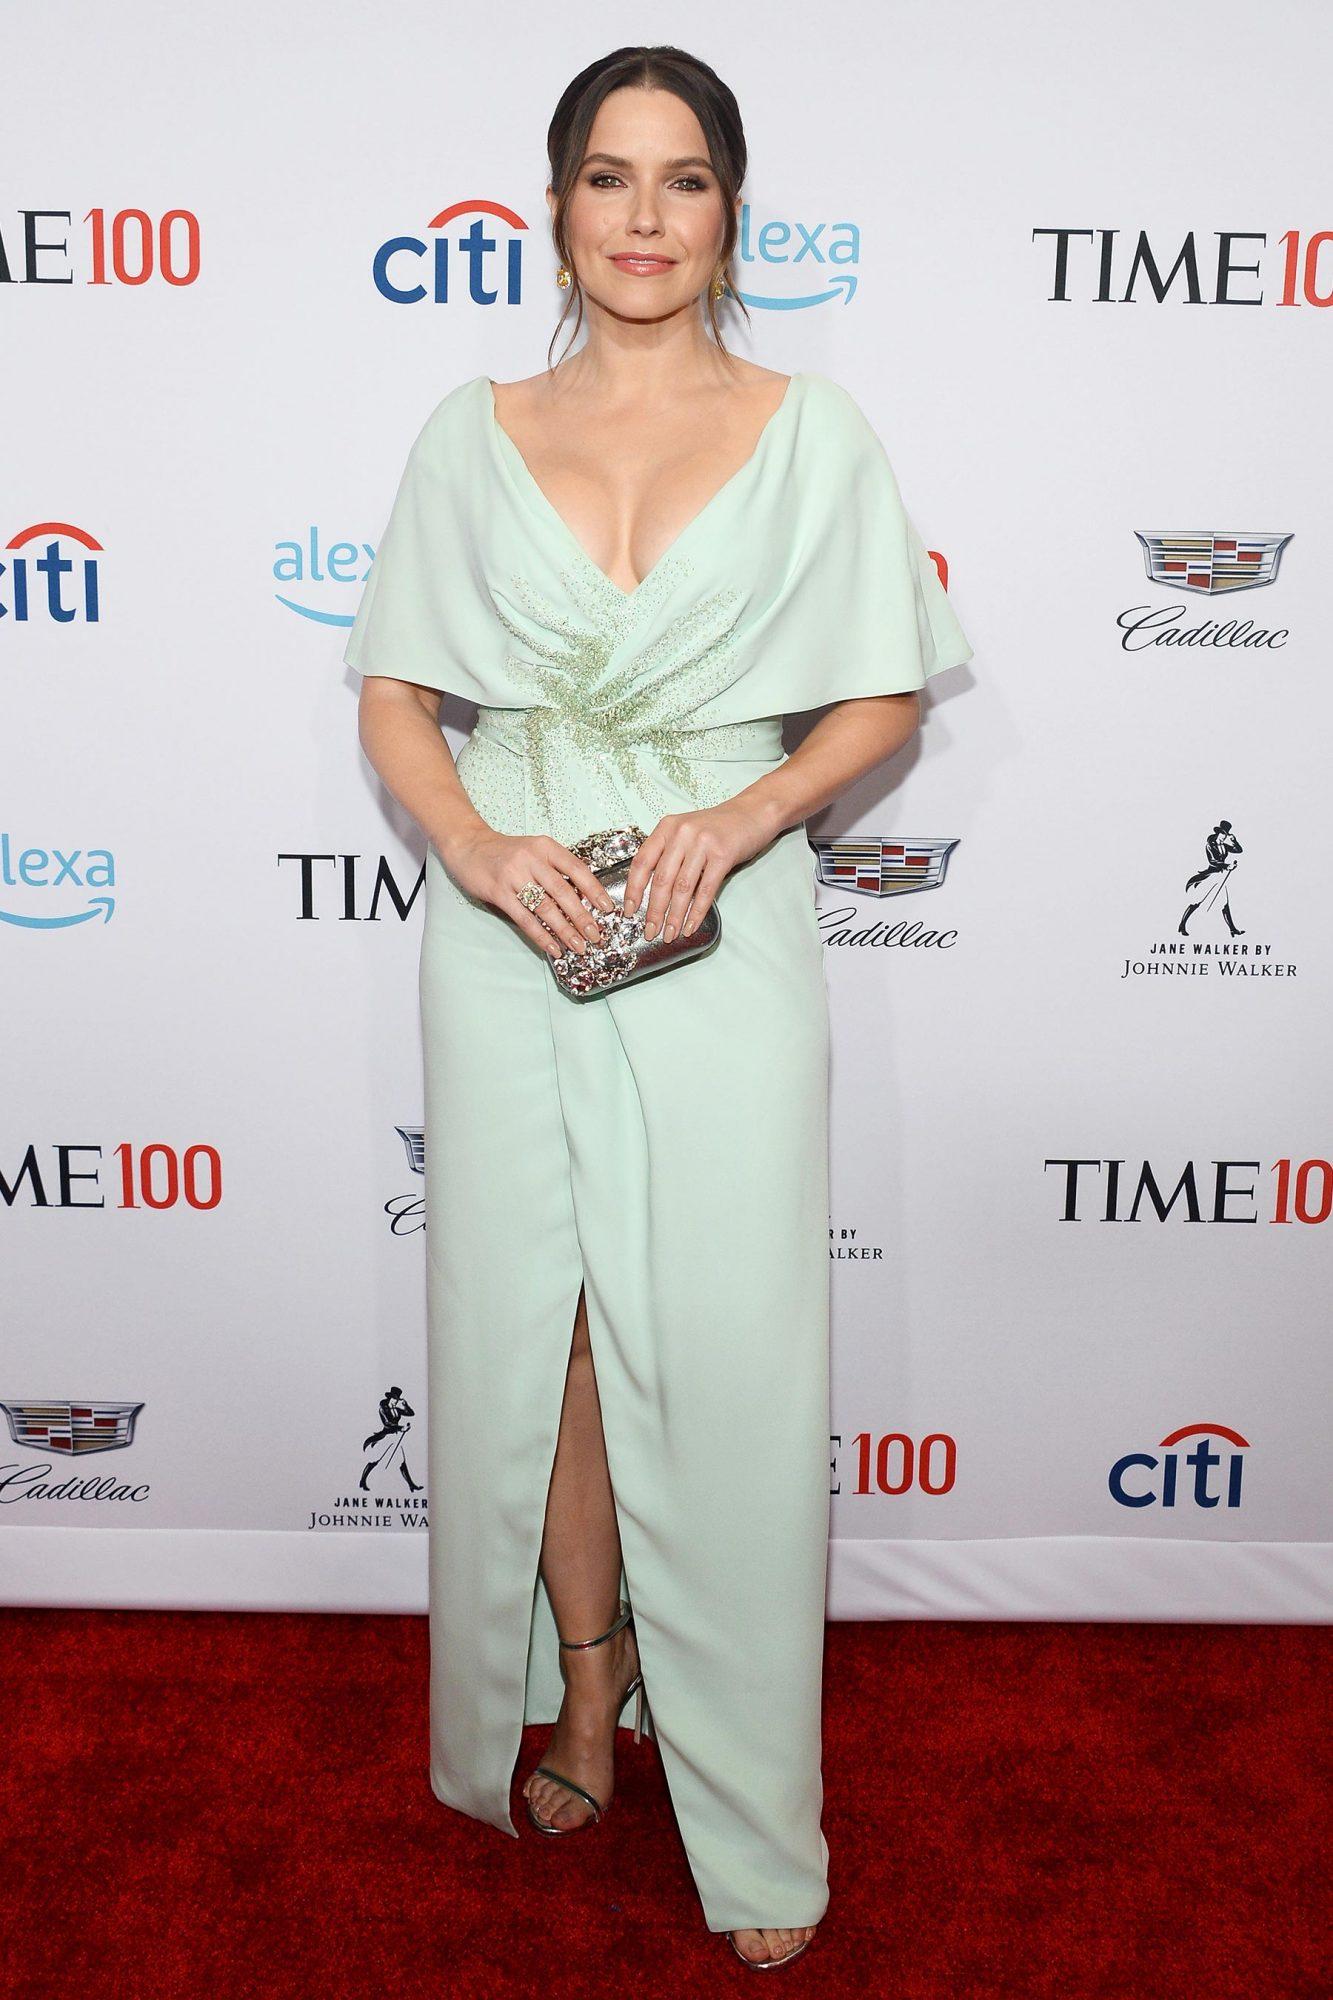 TIME 100 Gala 2019 - Lobby Arrivals